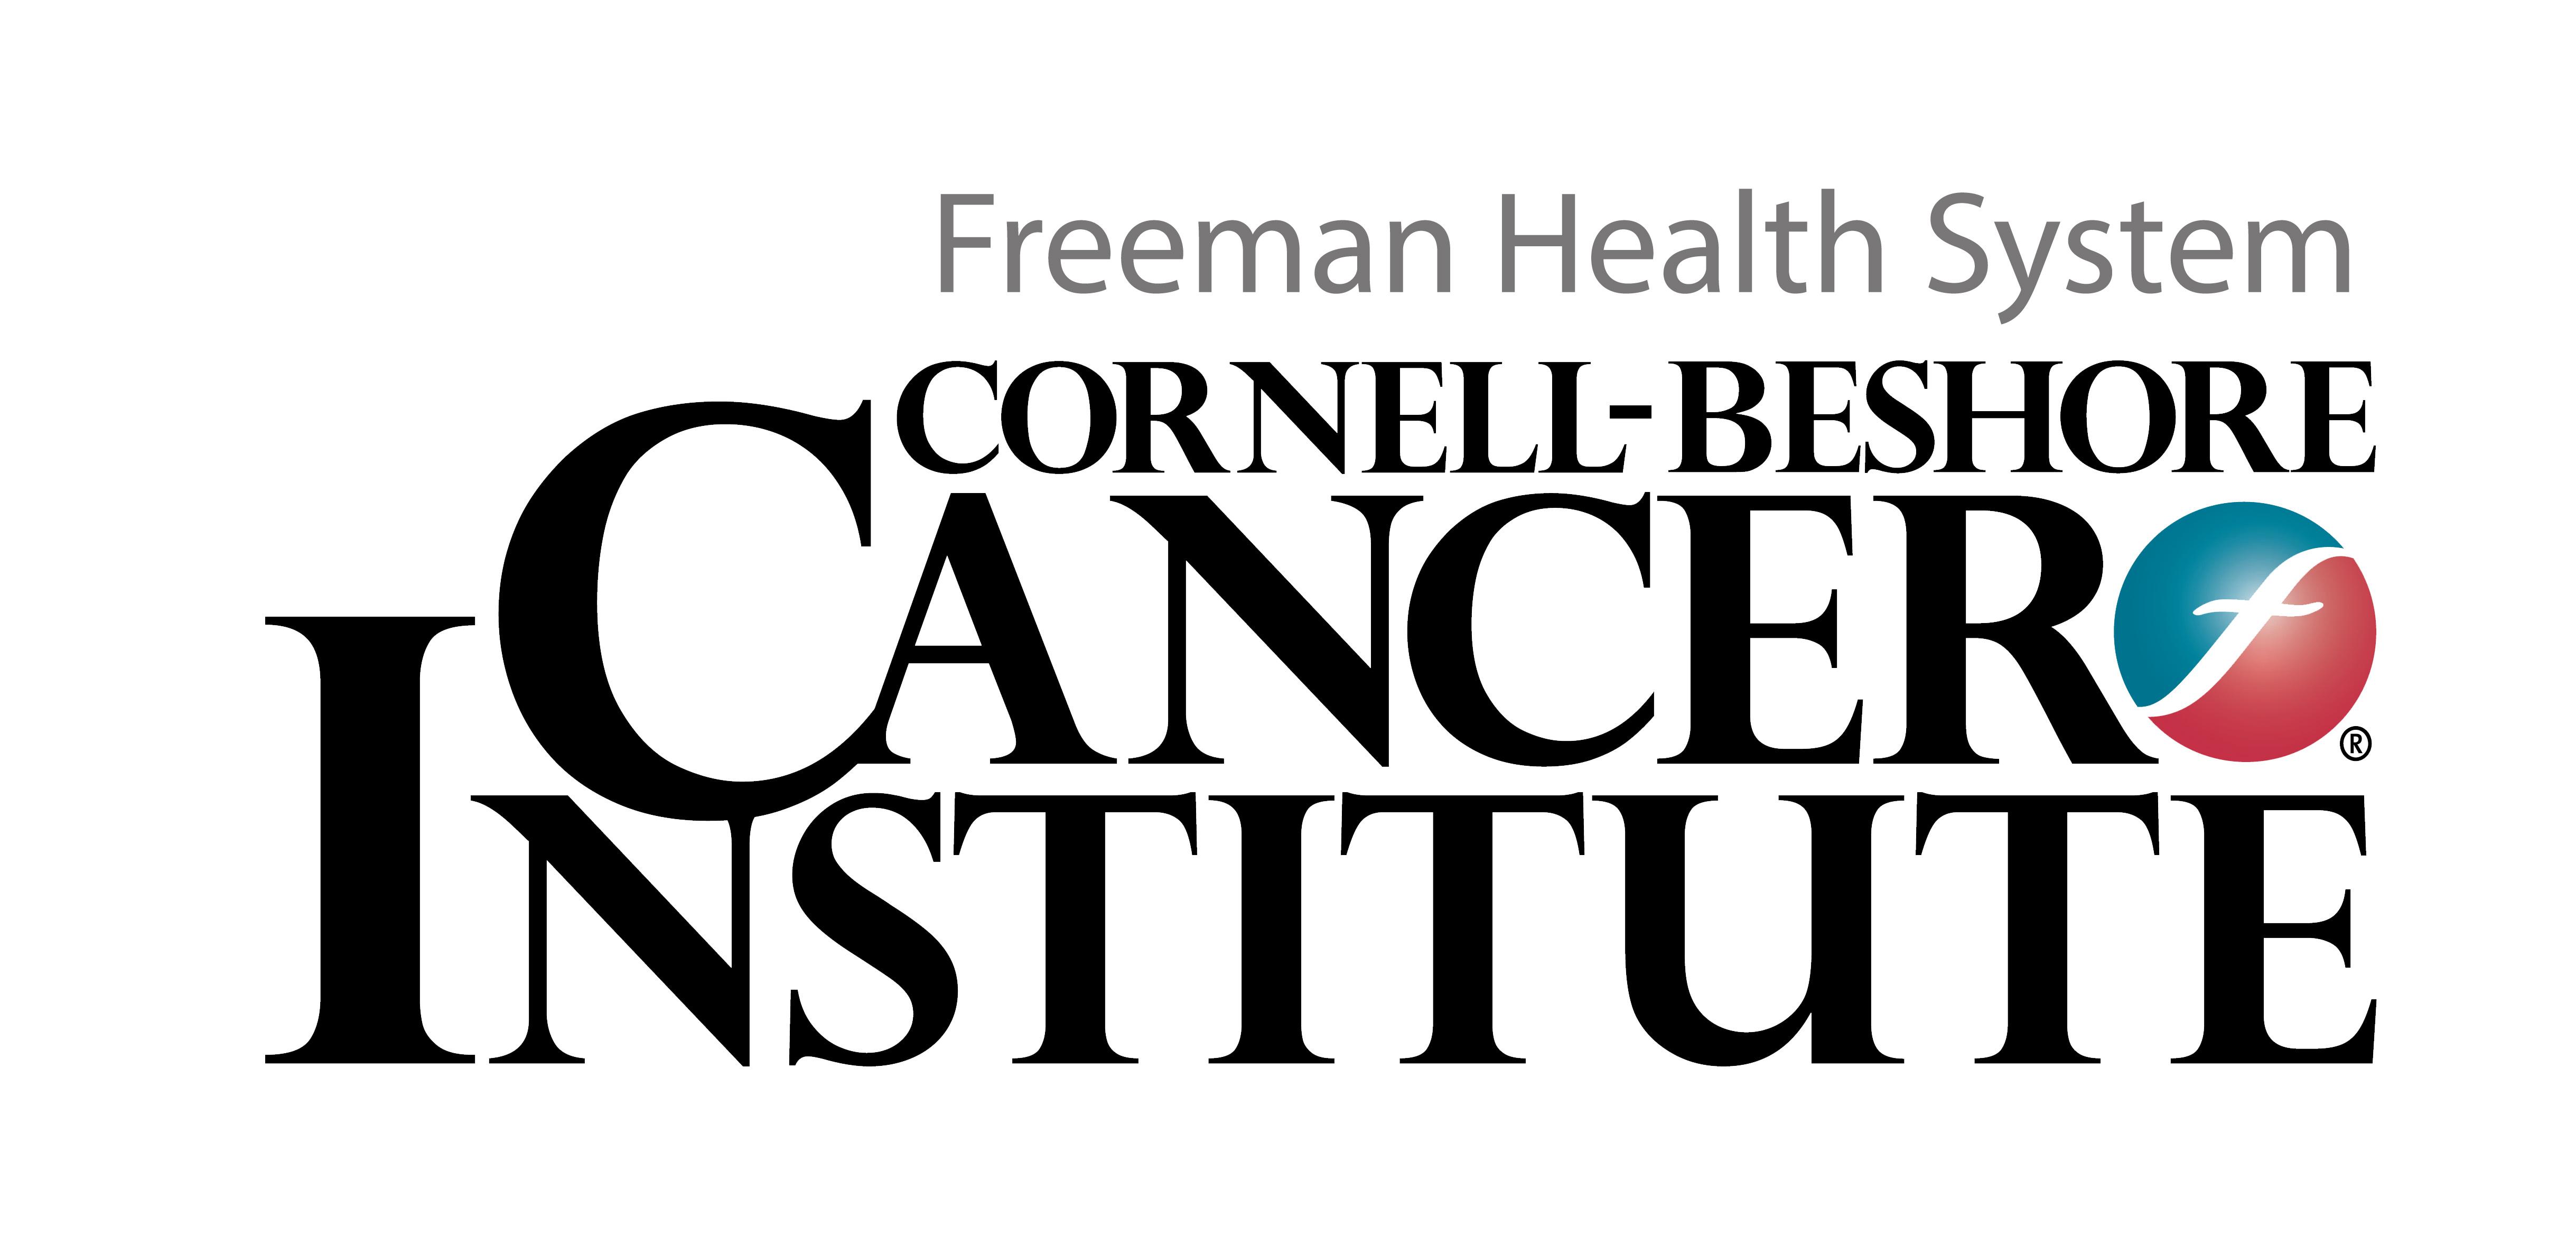 Cancer Institute Logo 2016